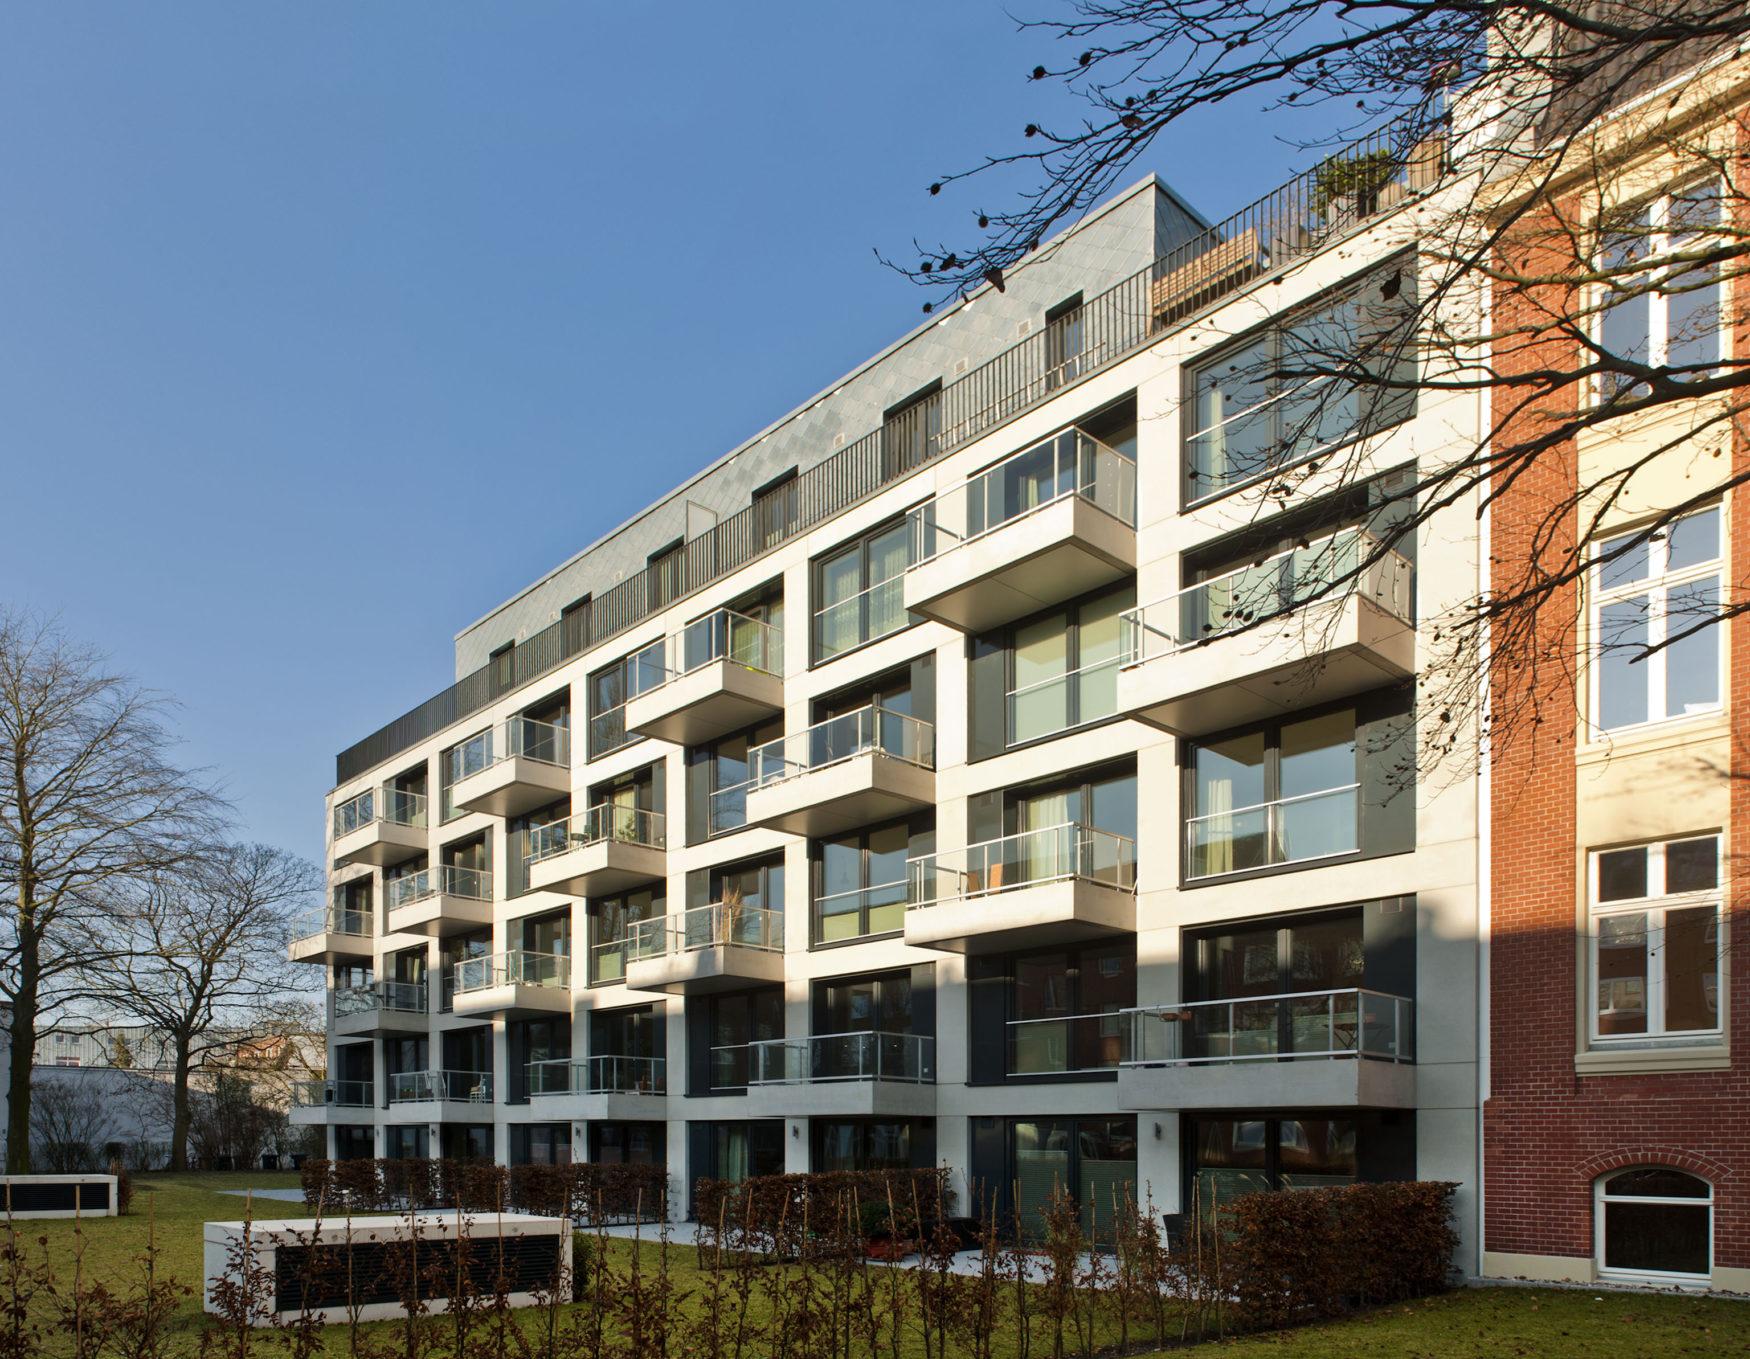 Friedrichsberger Lofts, Hamburg